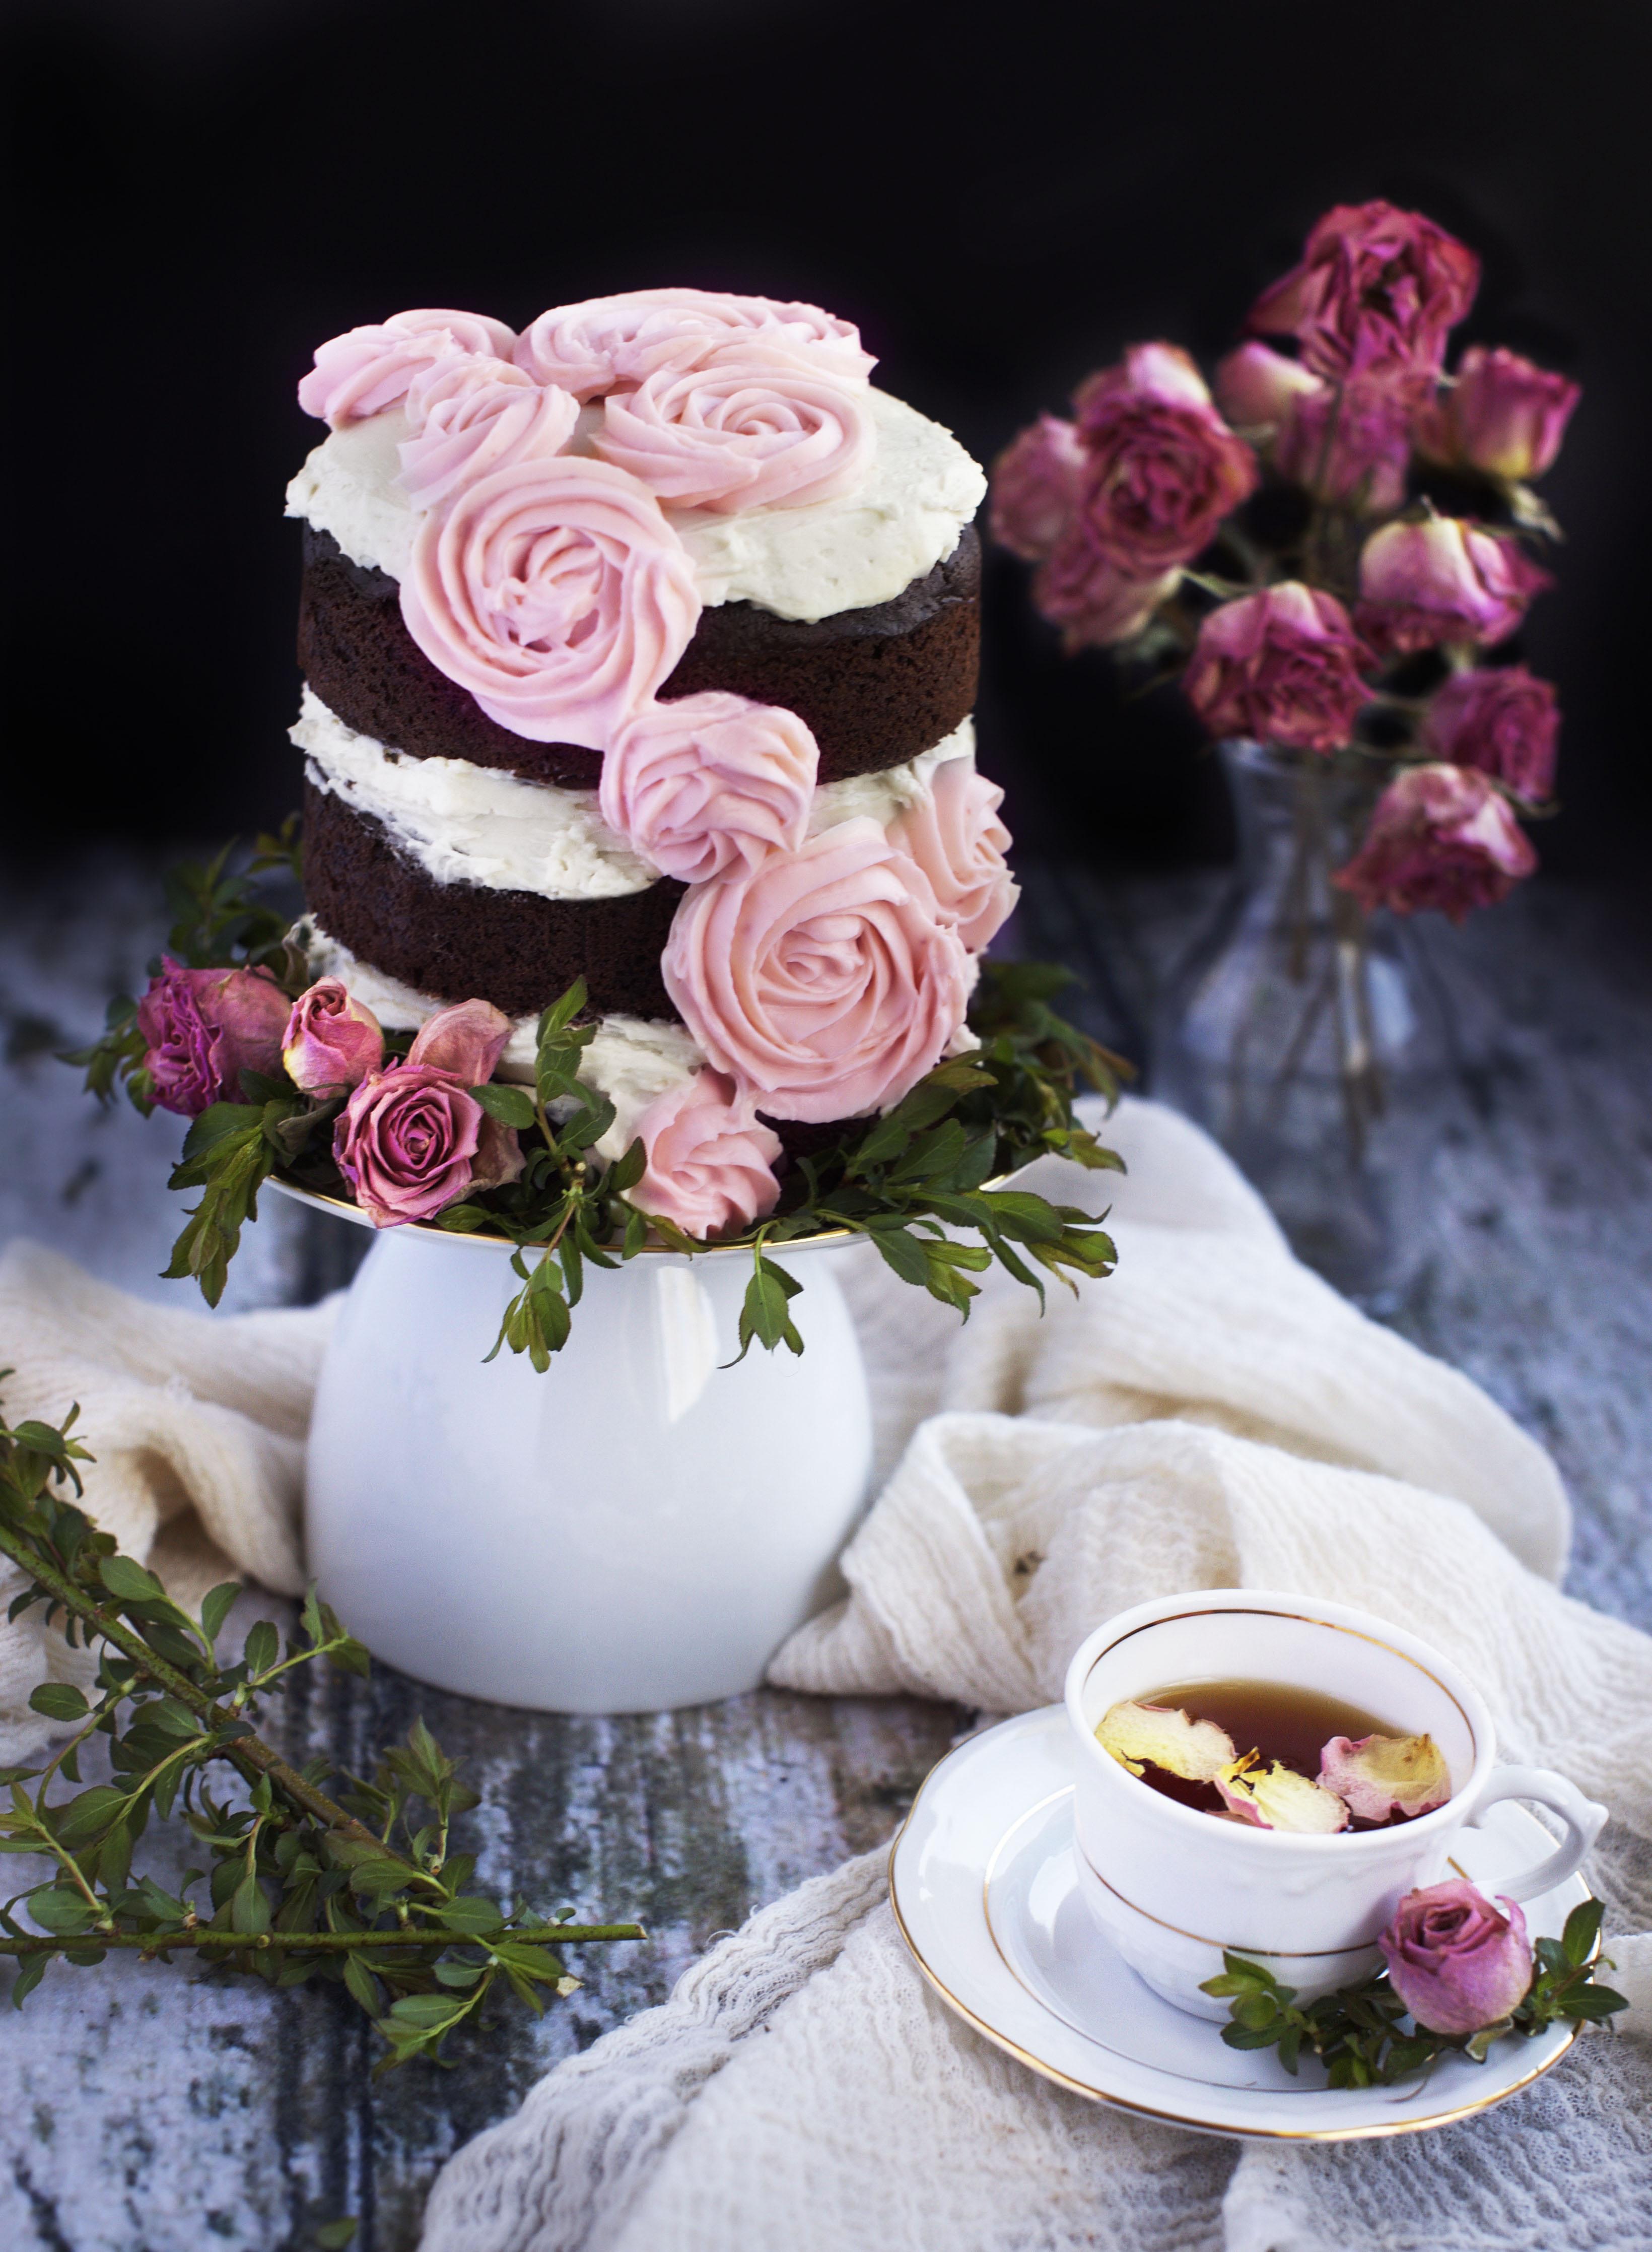 Low-Carb Dark Chocolate Layer Cake